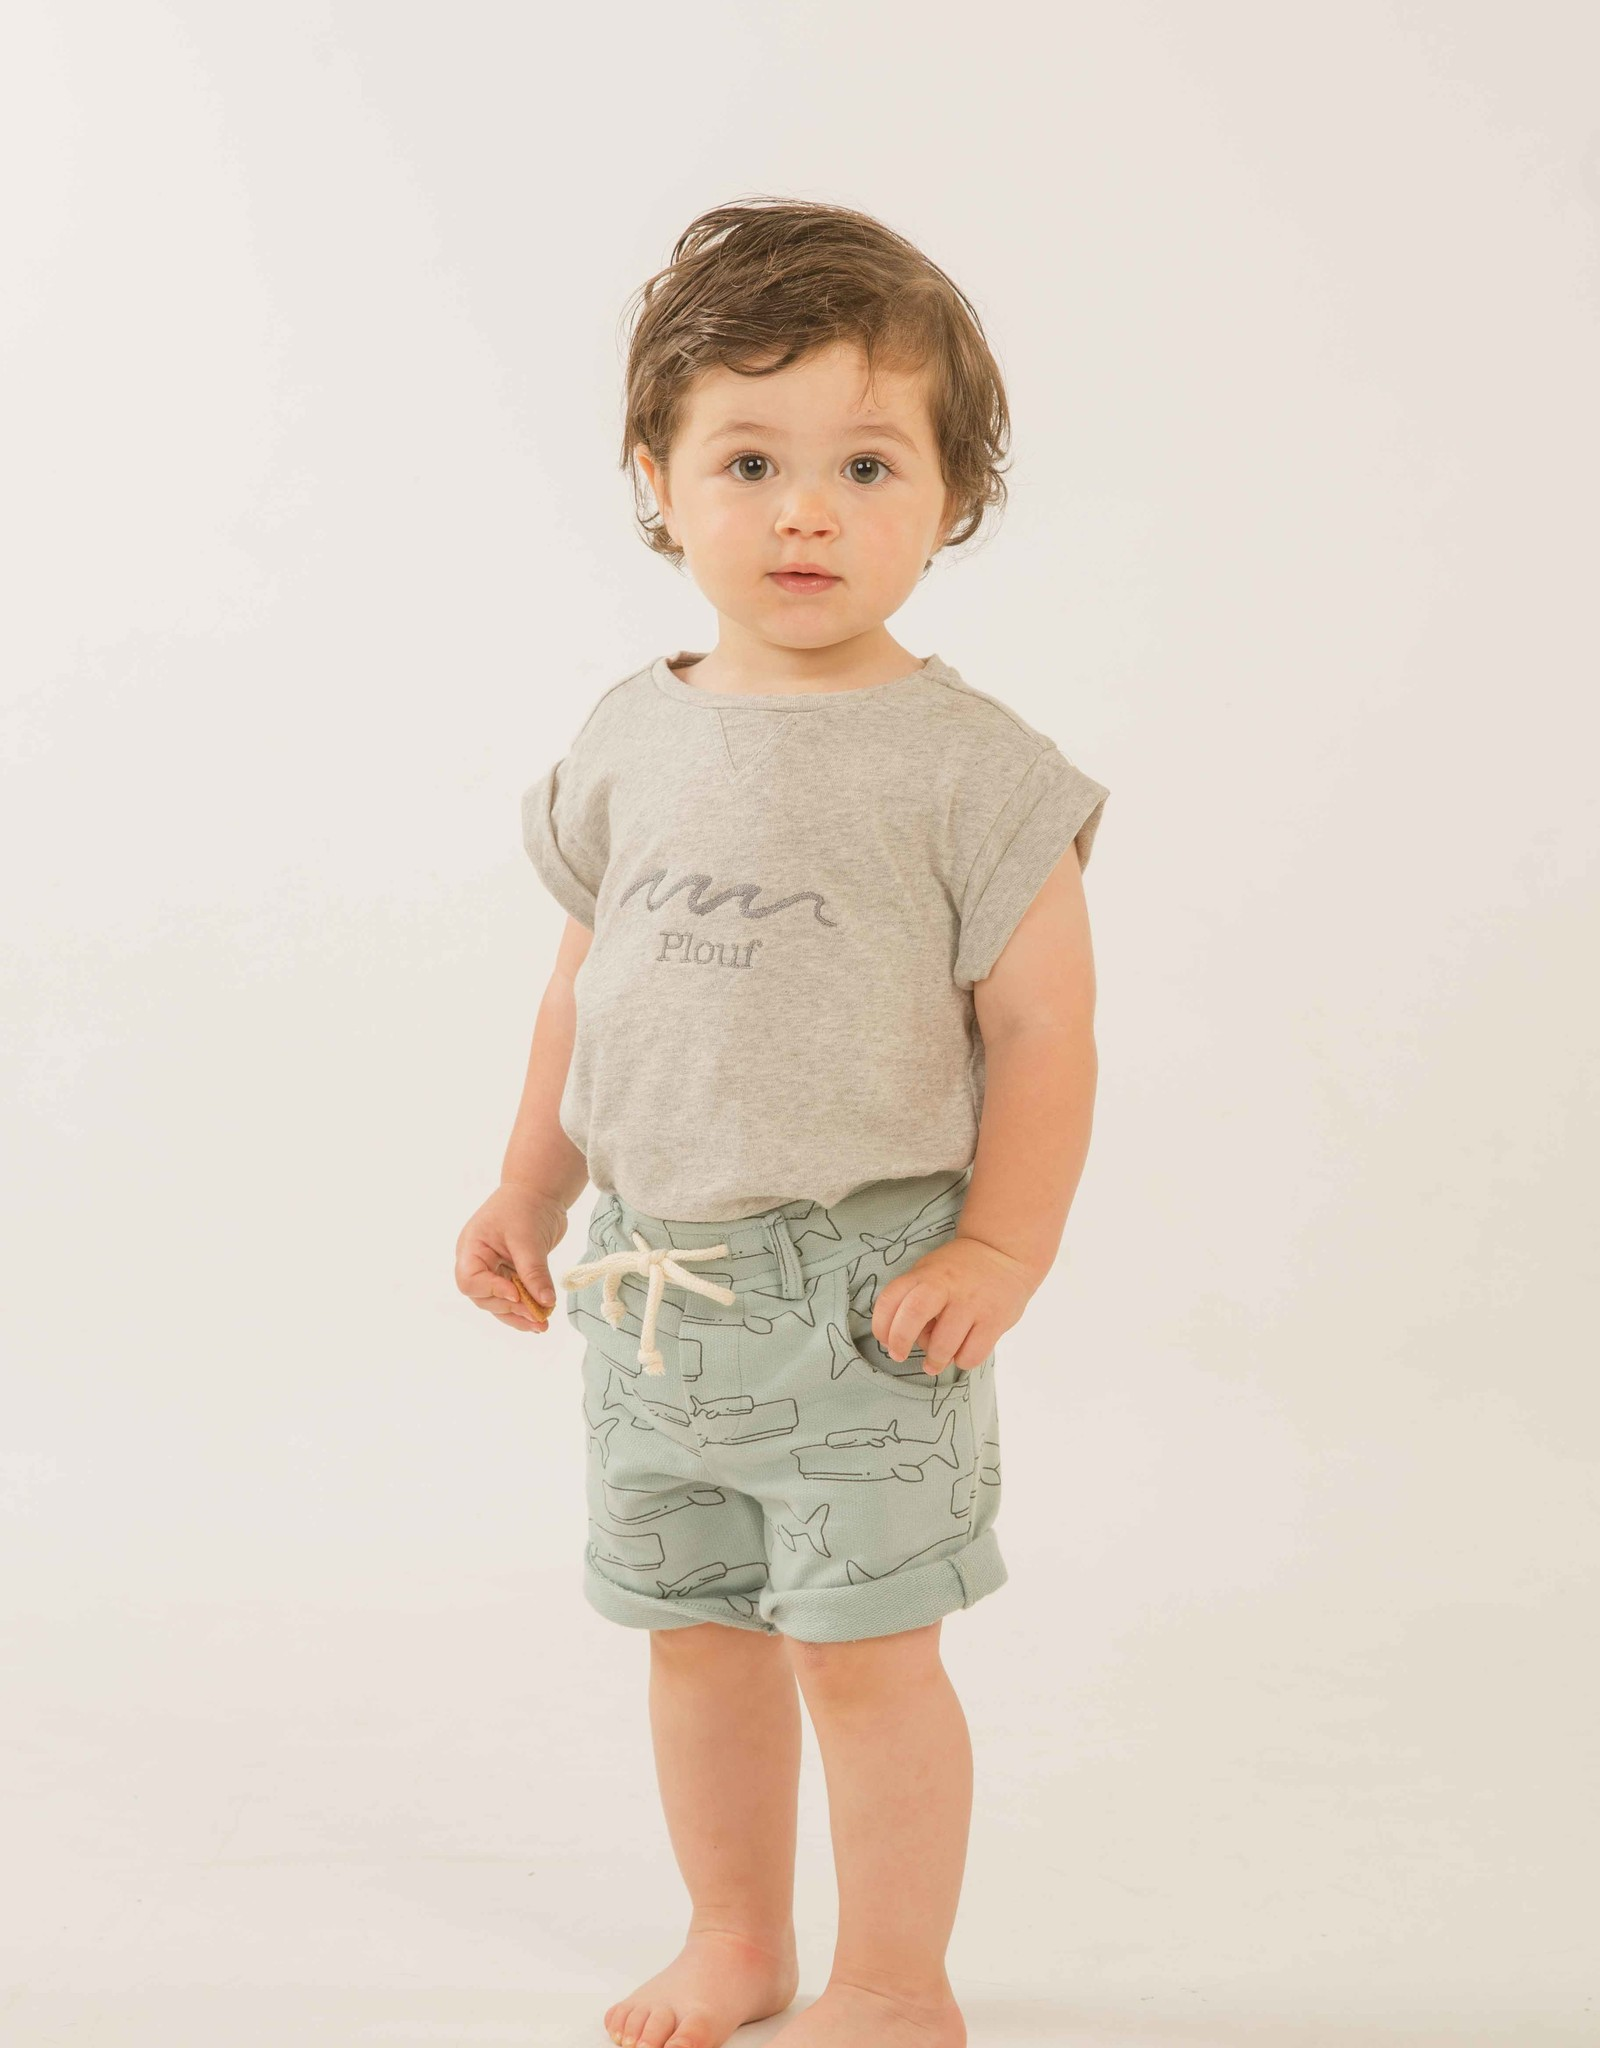 Les Petites Choses Plouf t-shirt